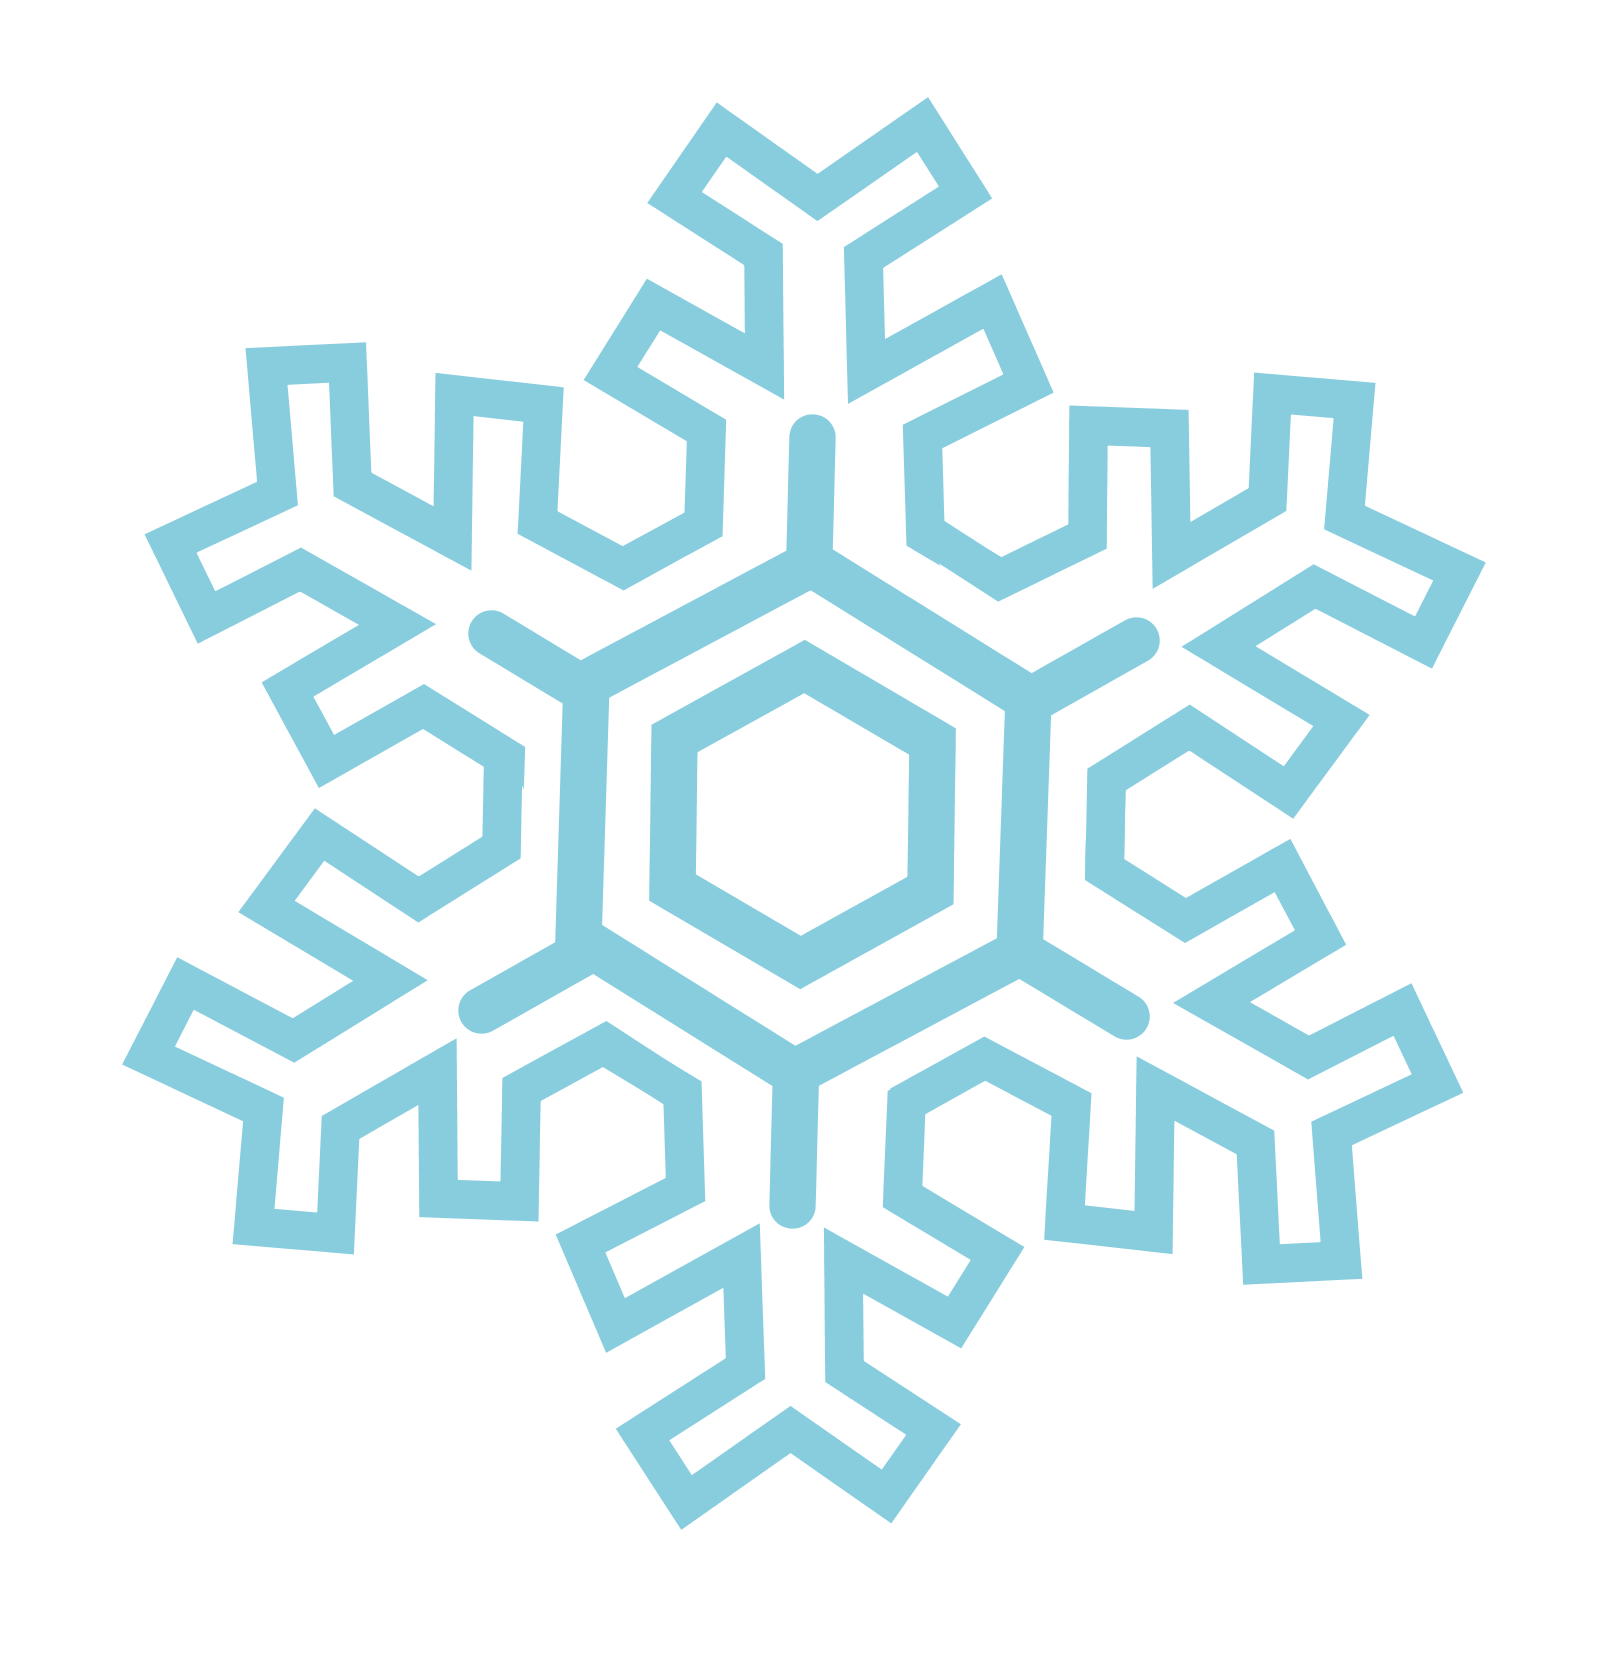 Snowflakes PNG - 6146